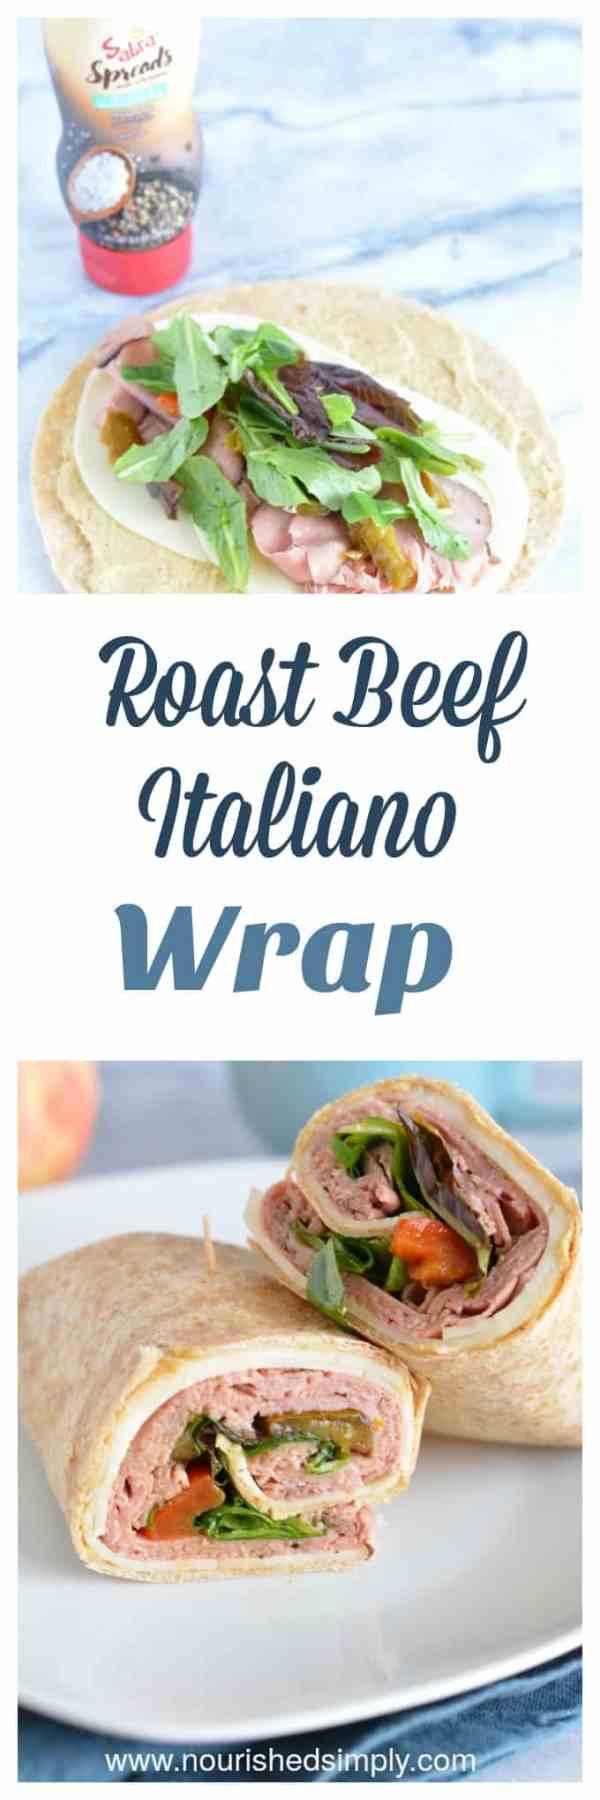 Roast Beef Italiano Wrap Nourished Simply